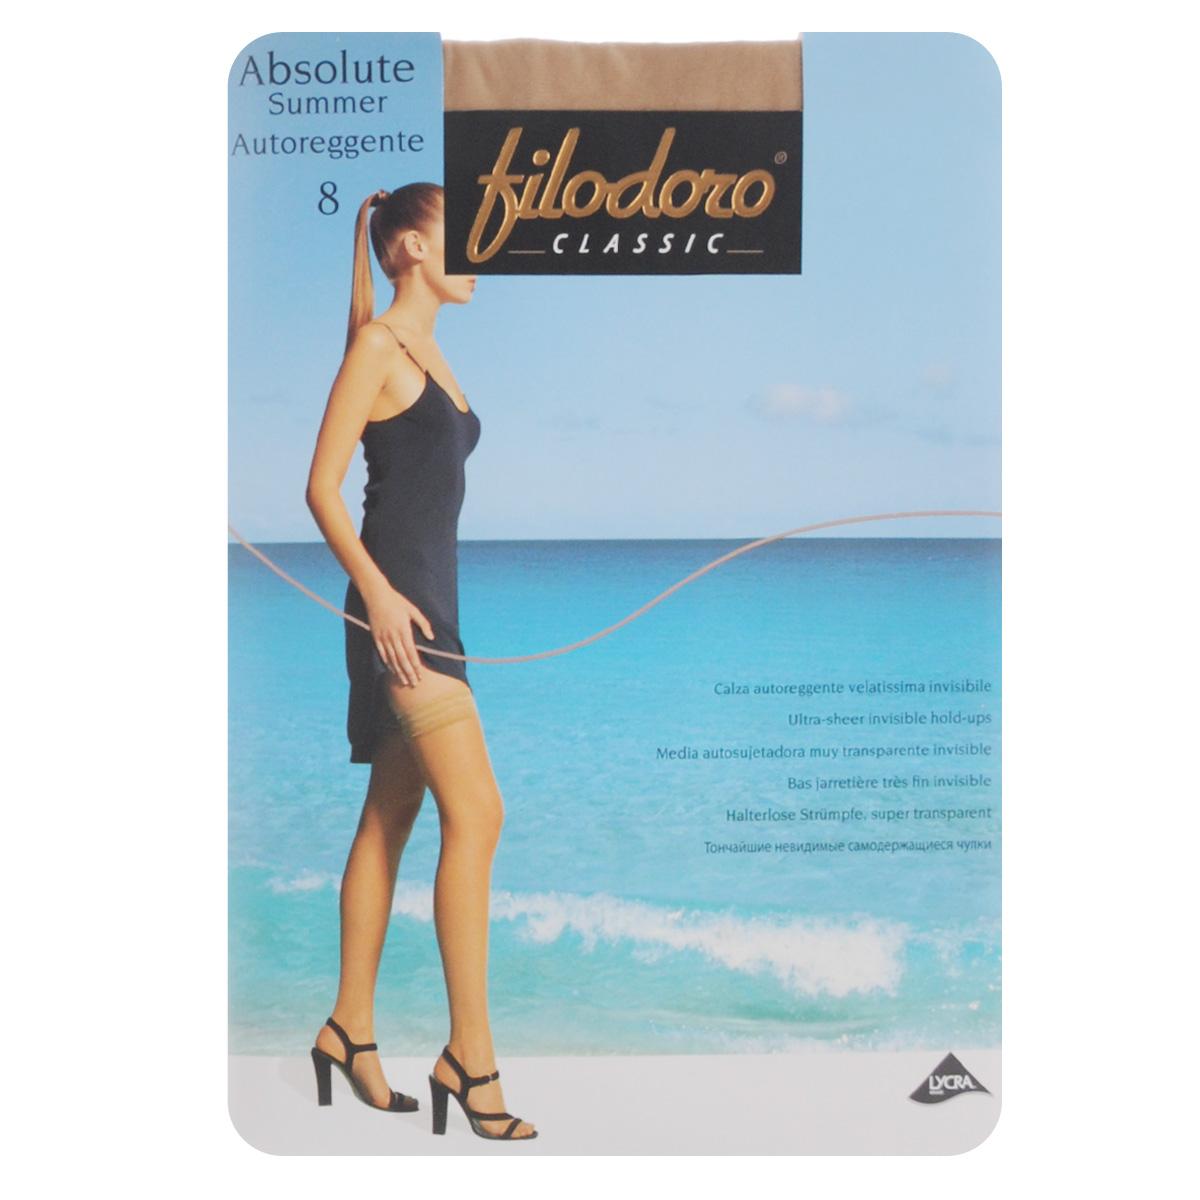 Чулки Filodoro Classic Absolute Summer 8 Autoreggente, цвет: Playa (телесный). C109801FC. Размер 3 (M) чулки с блестящим узором 1 2